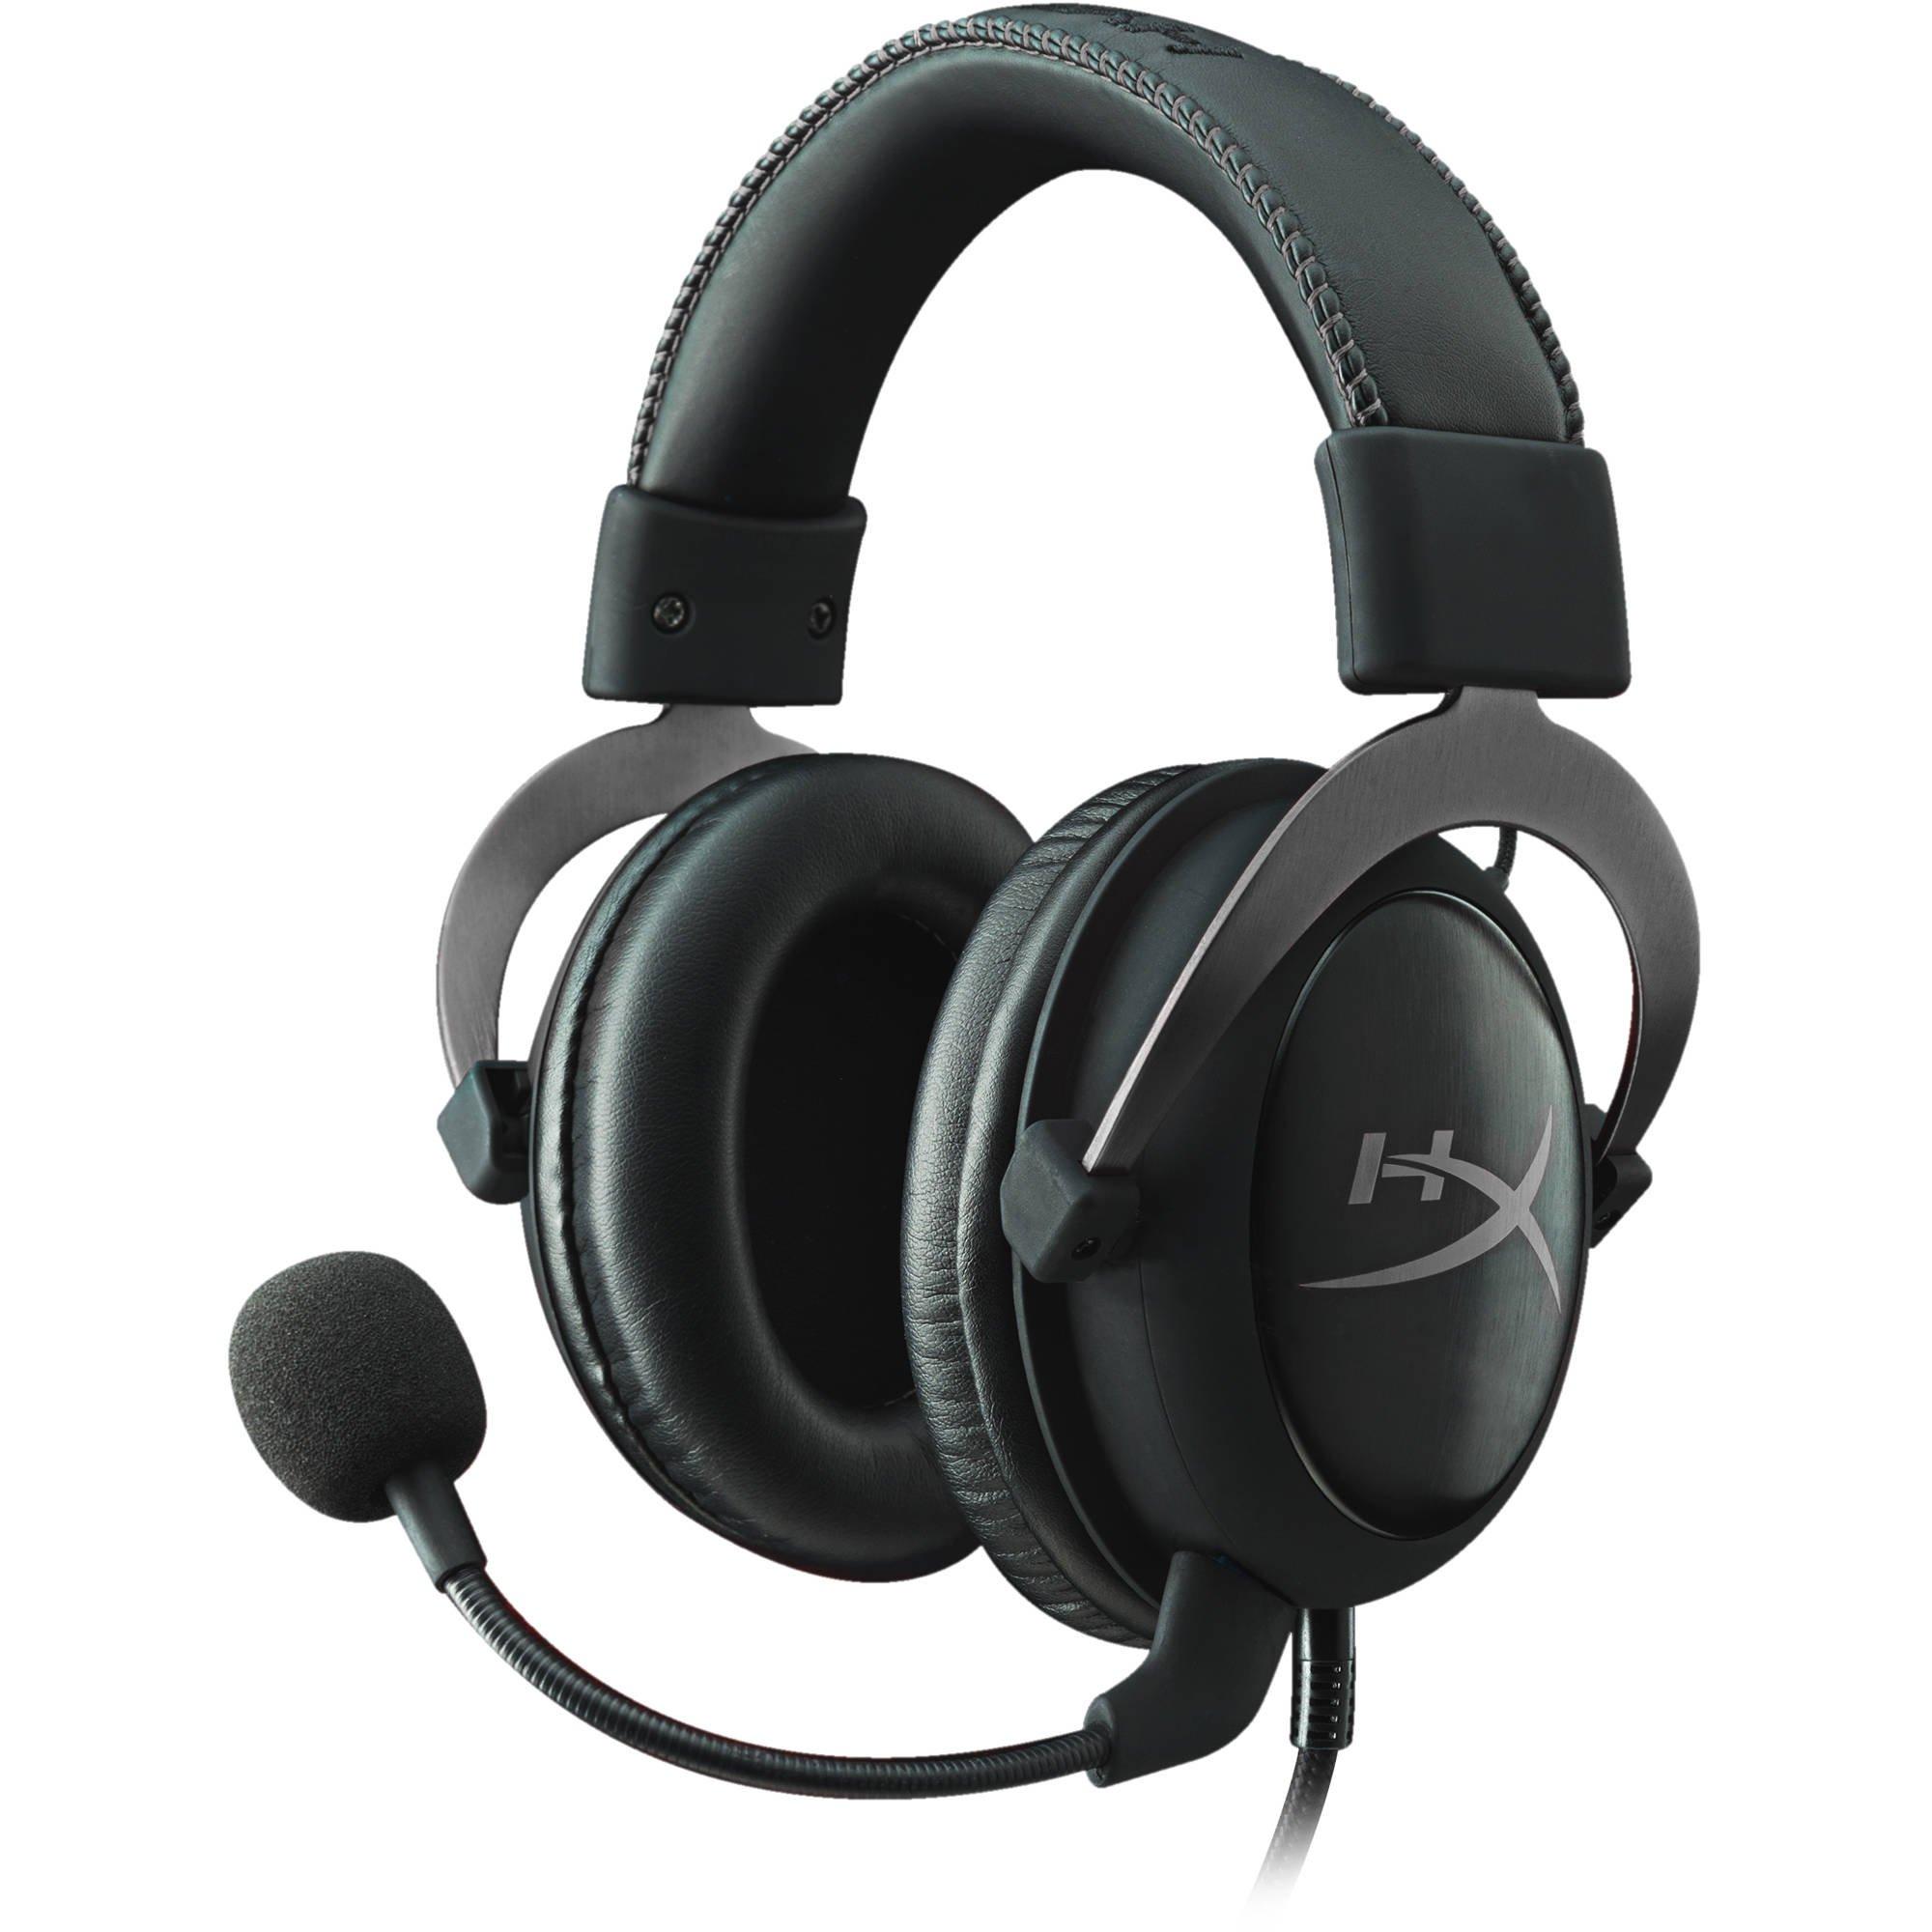 HyperX - Cloud II Gaming Headset For PC/PS4/Mac/Mobile (Grey Metal)